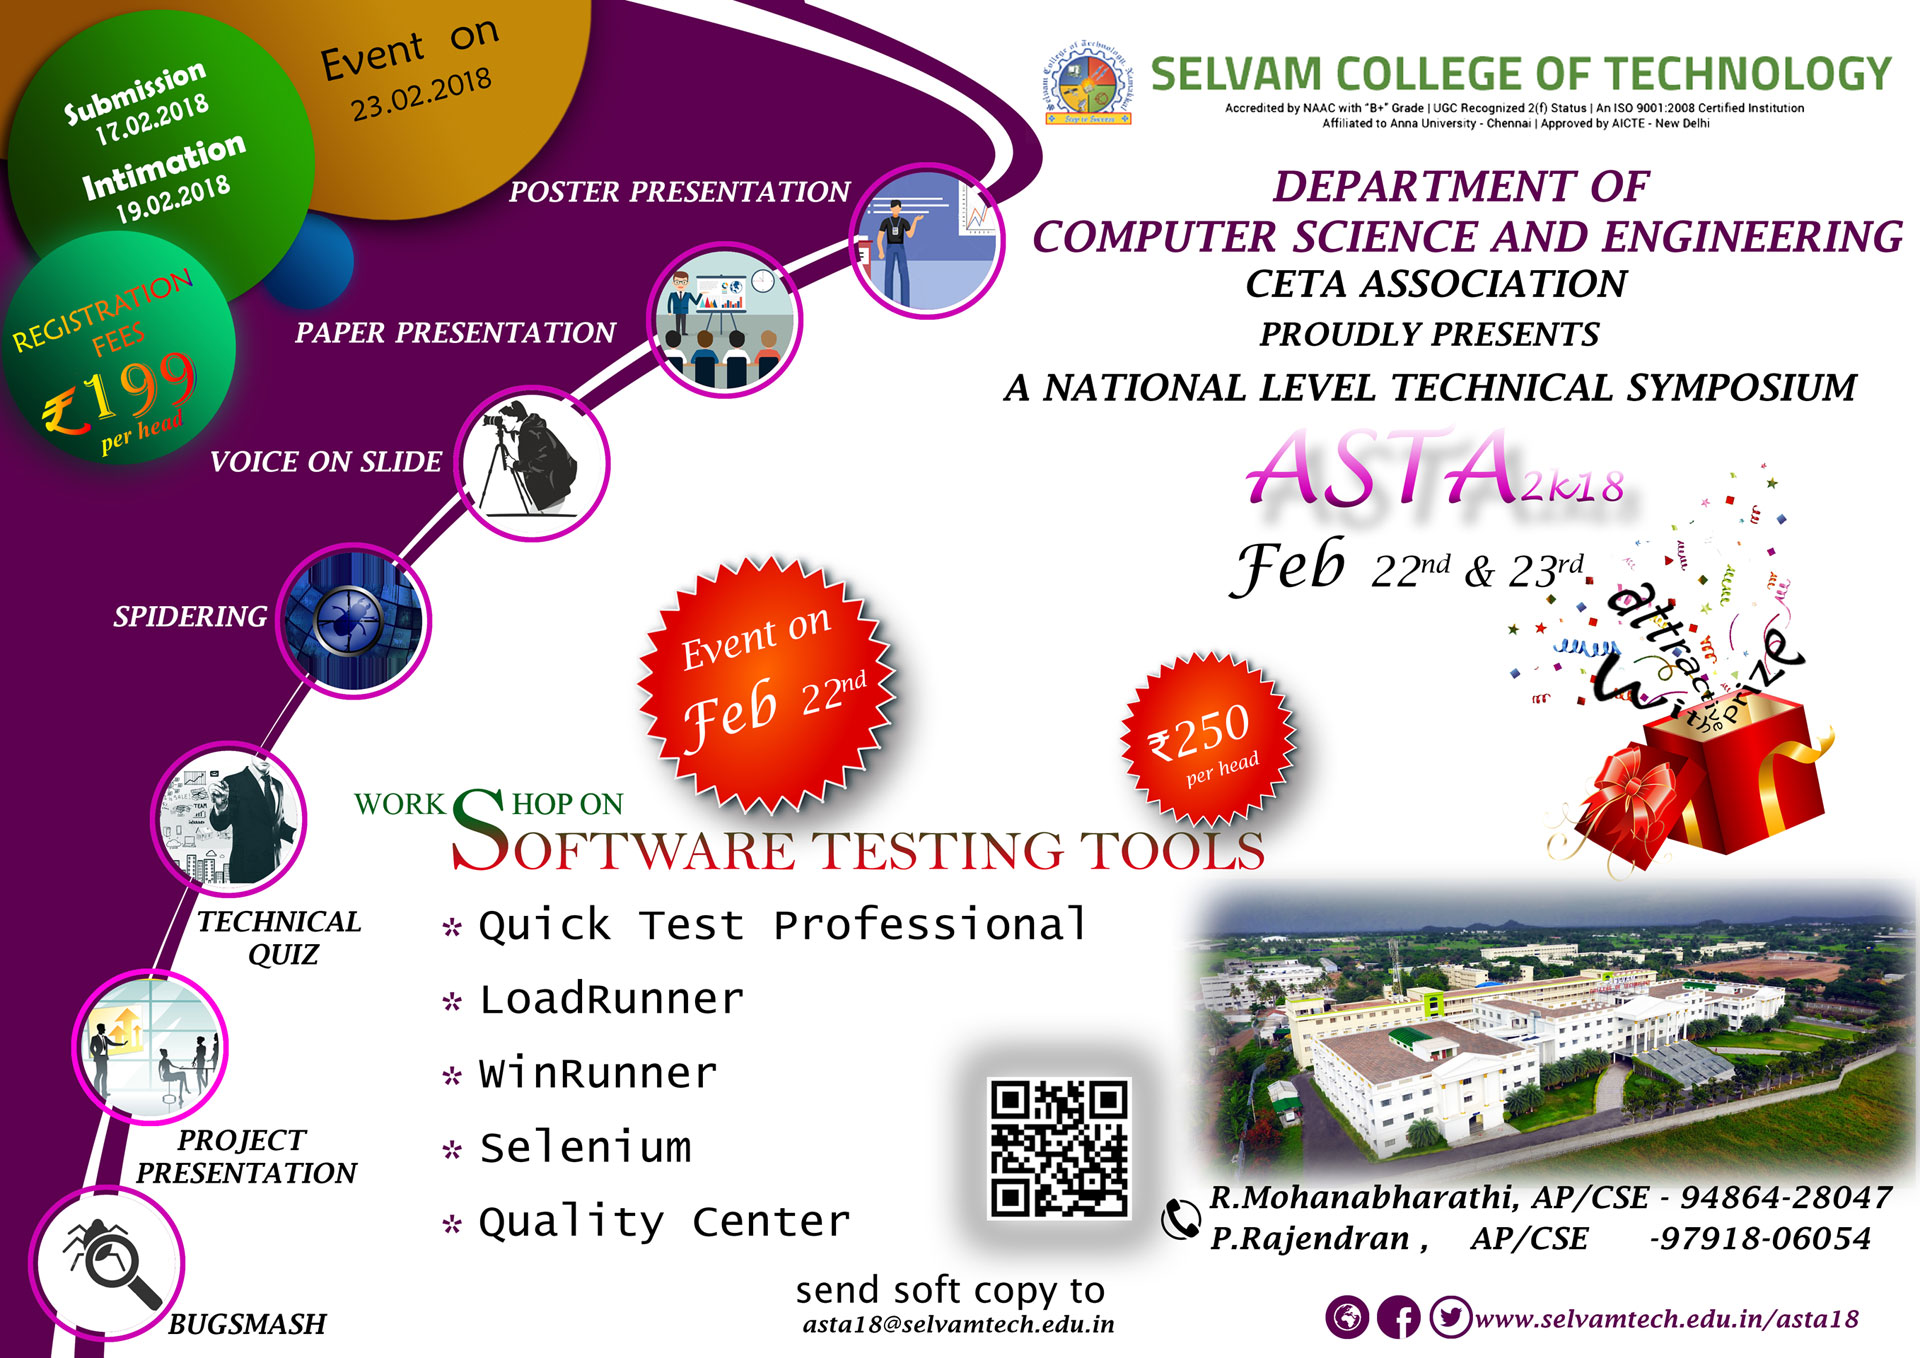 National Level Technical Symposium ASTA 2K18 - Selvam